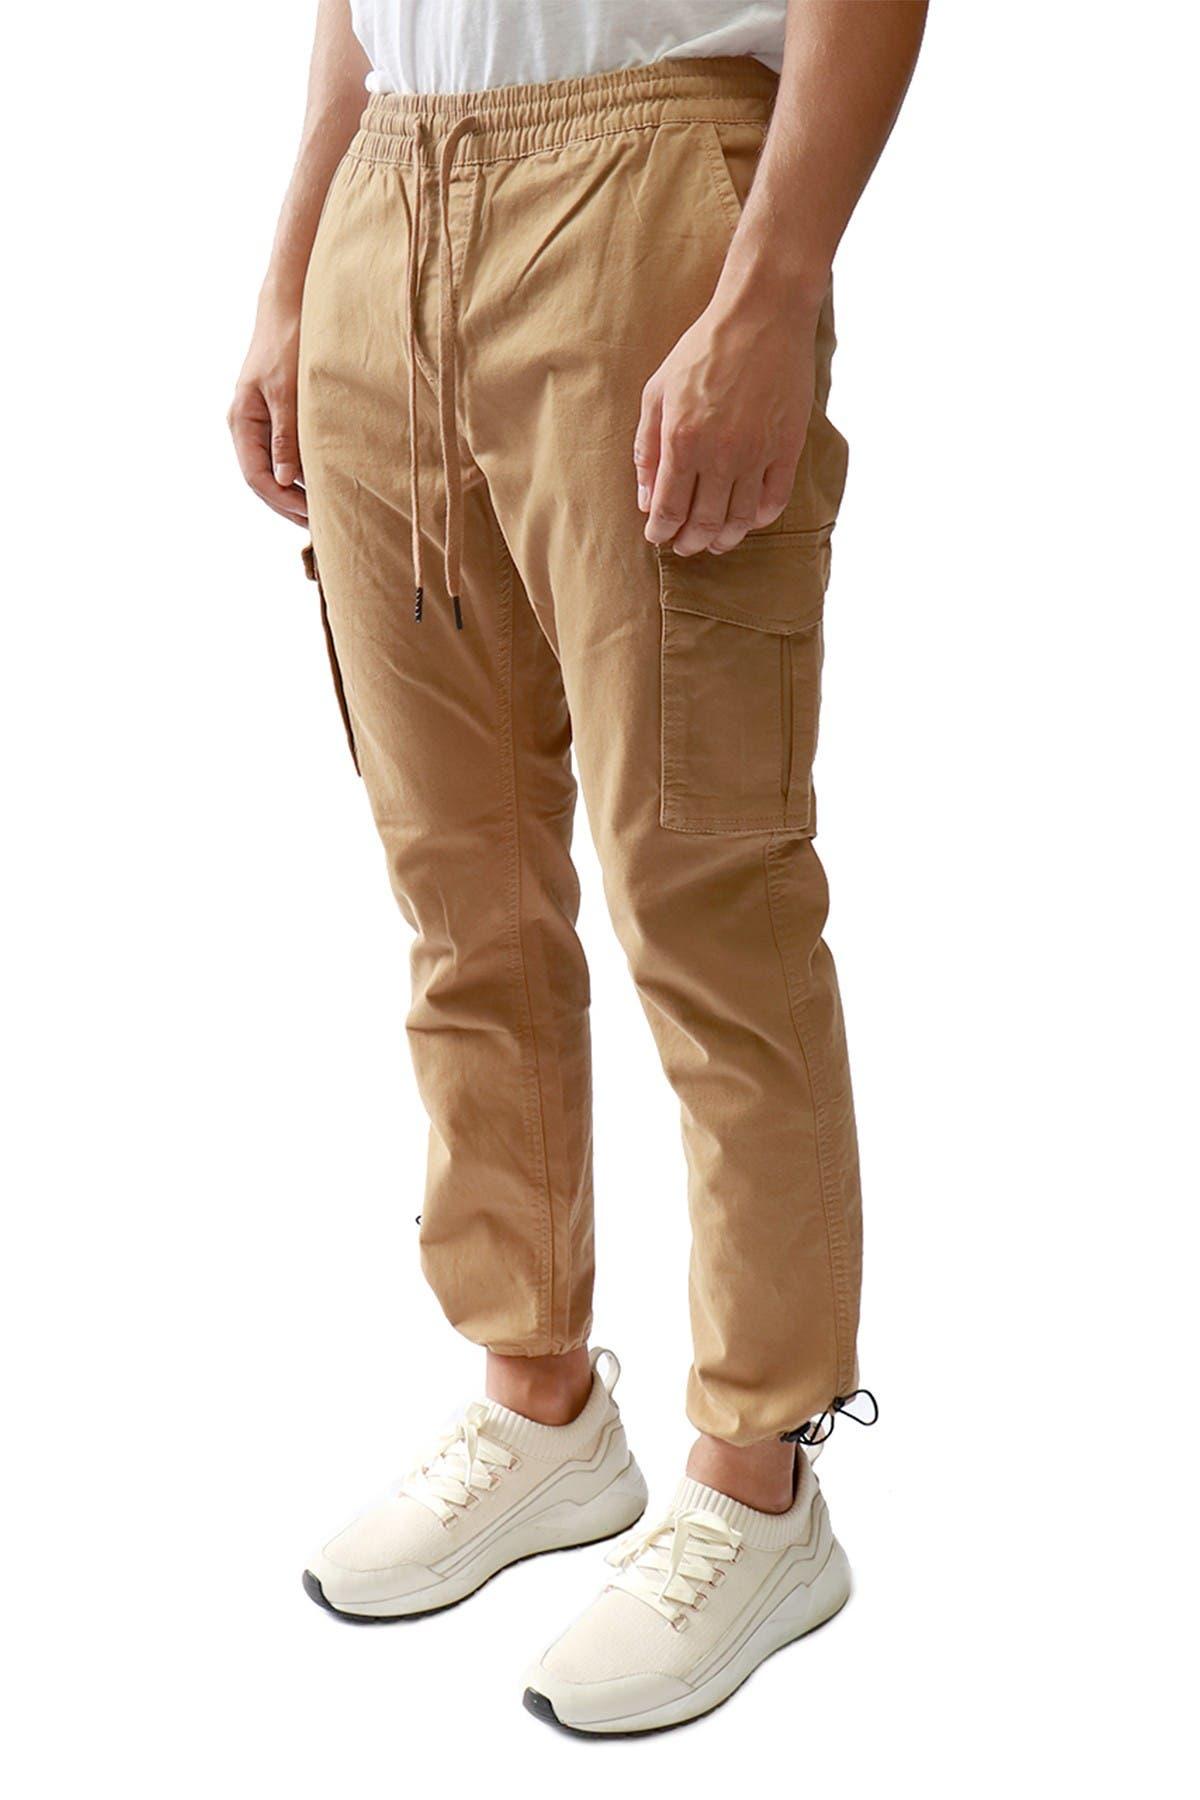 Image of HEDGE Men's Woven Pants